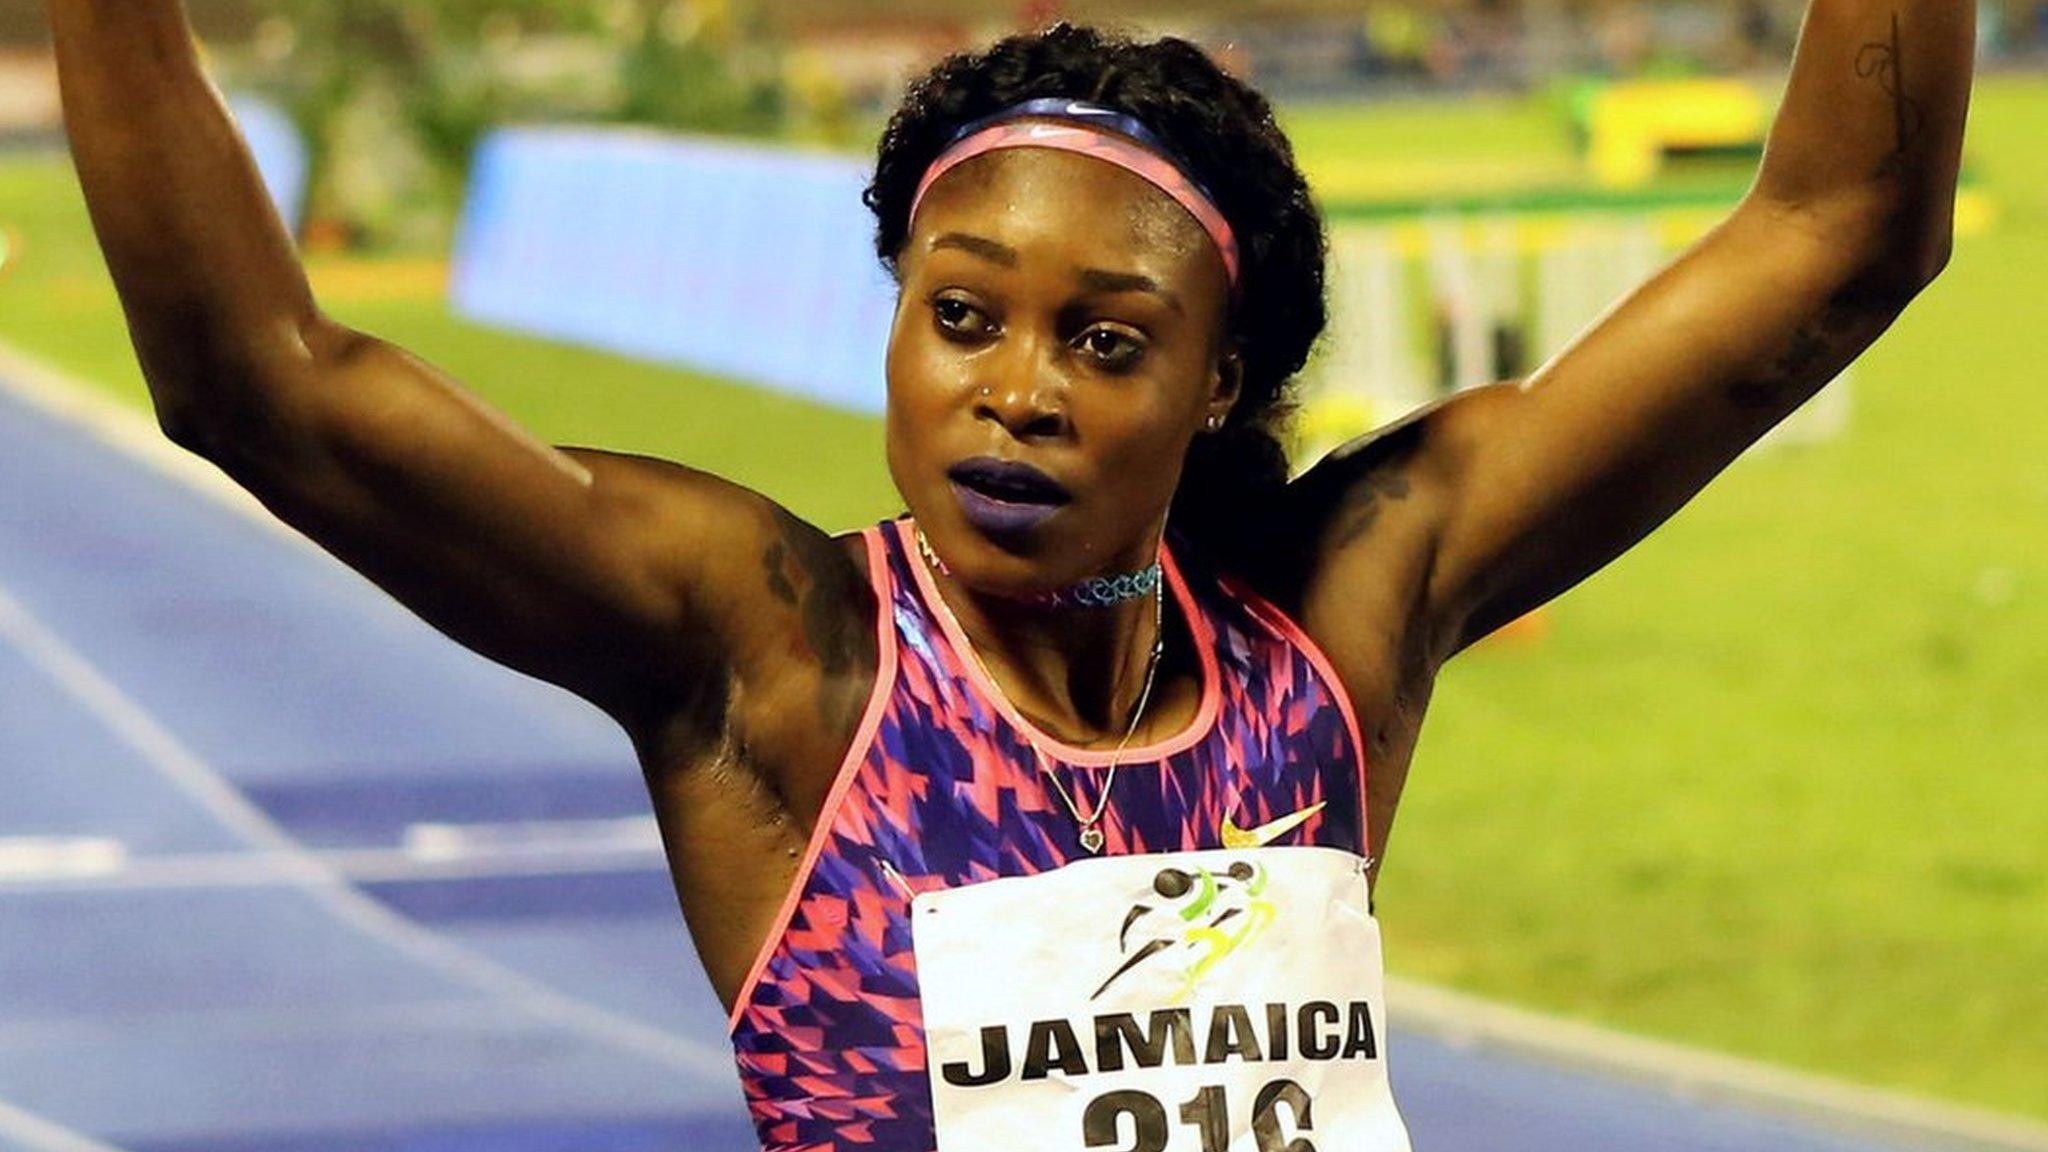 IAAF World Challenge: Elaine Thompson wins 200m in Jamaica